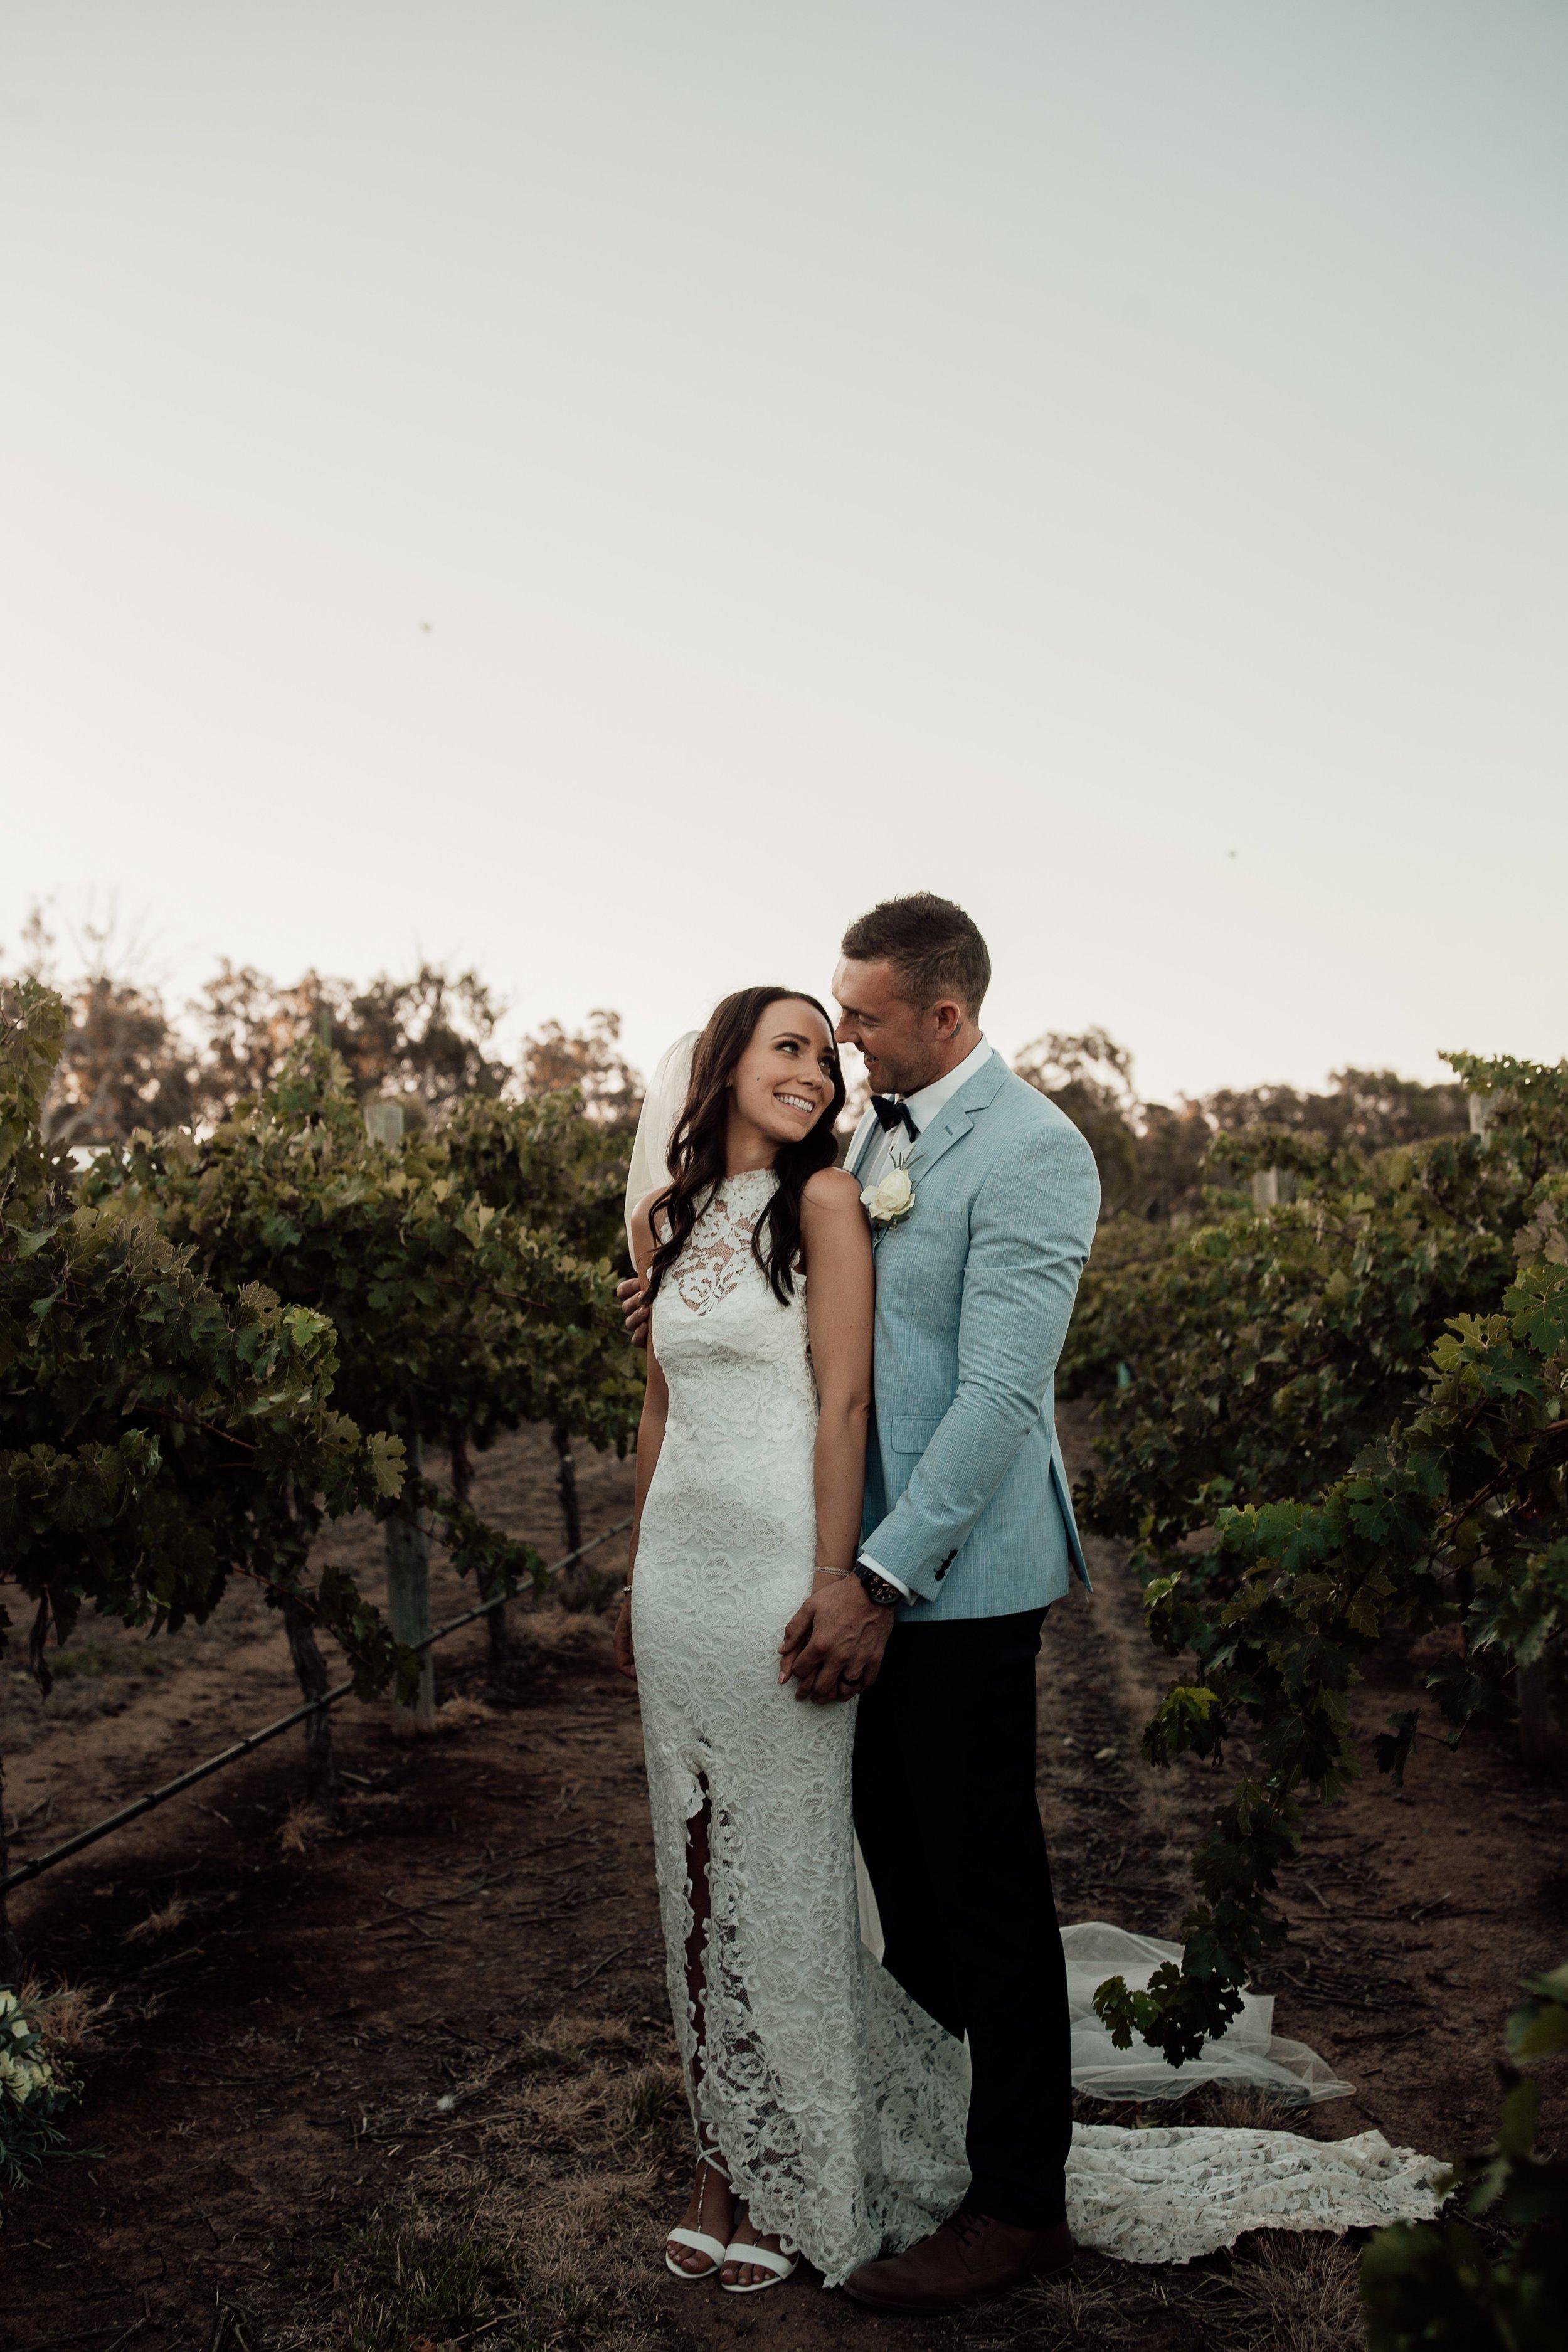 mickalathomas_puremacphotography_weddingphotographer_couplephotographer_Sheppartonphotographer_2915.jpg